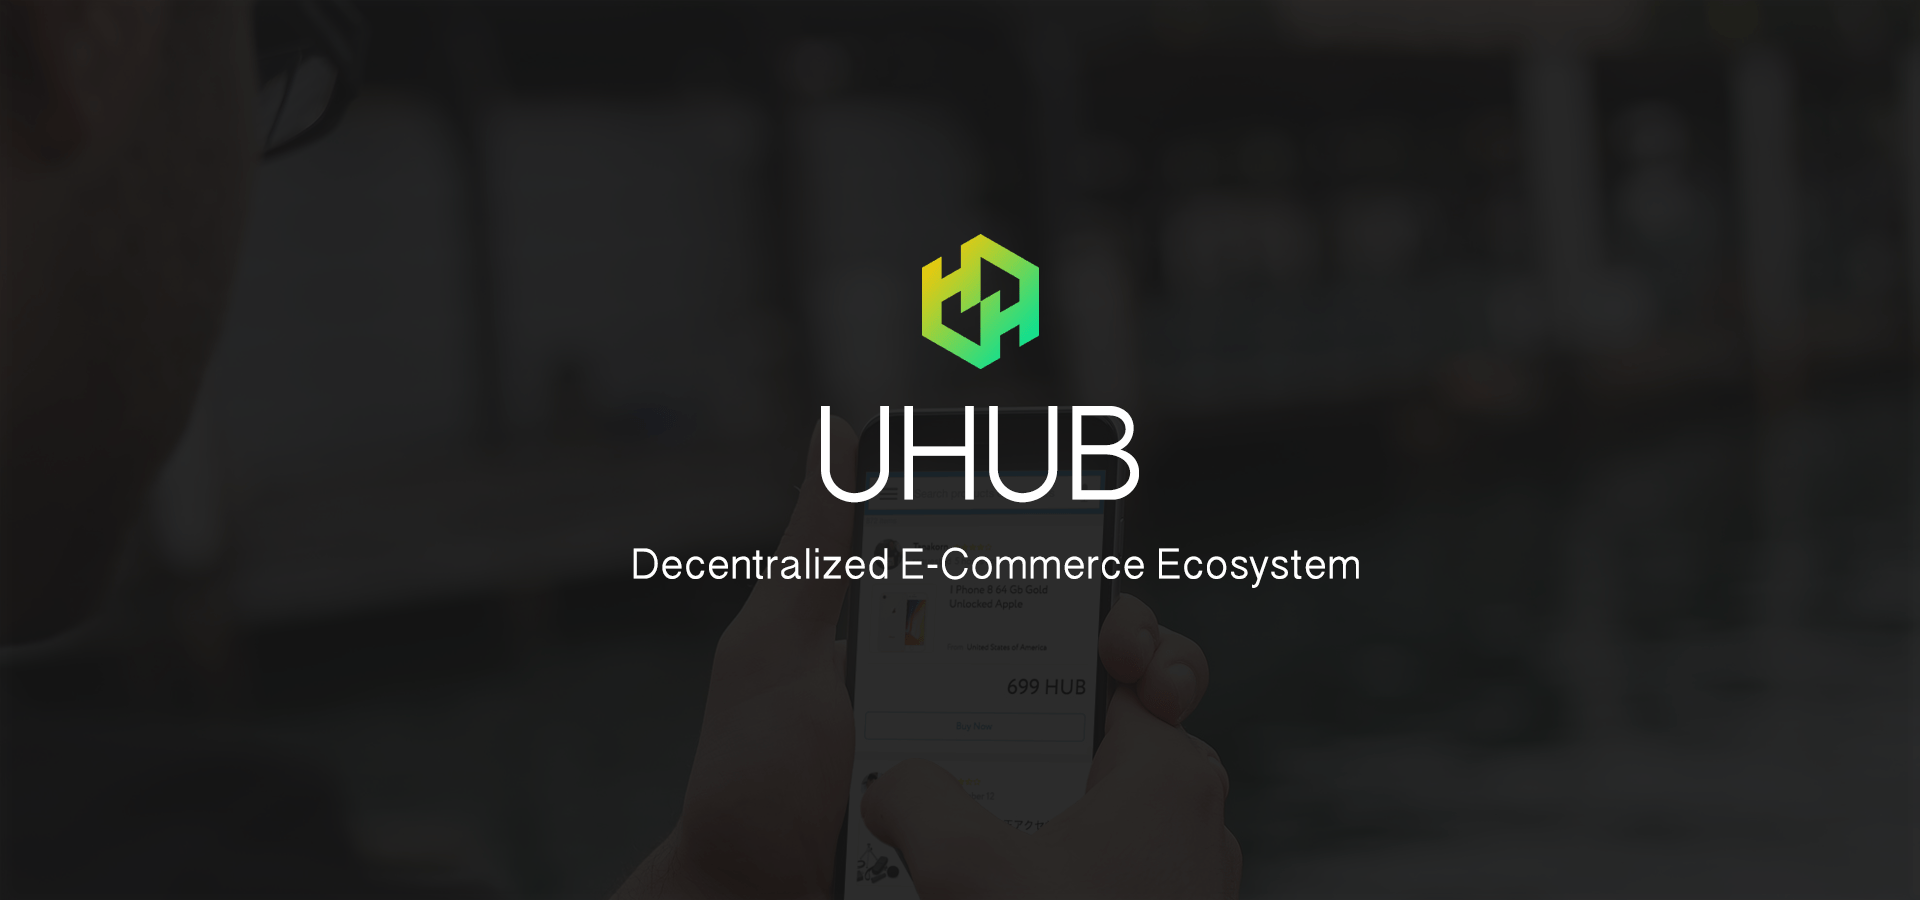 UHUB.IO to Use Ethereum Blockchain for a Revolutionary E-commerce Platform